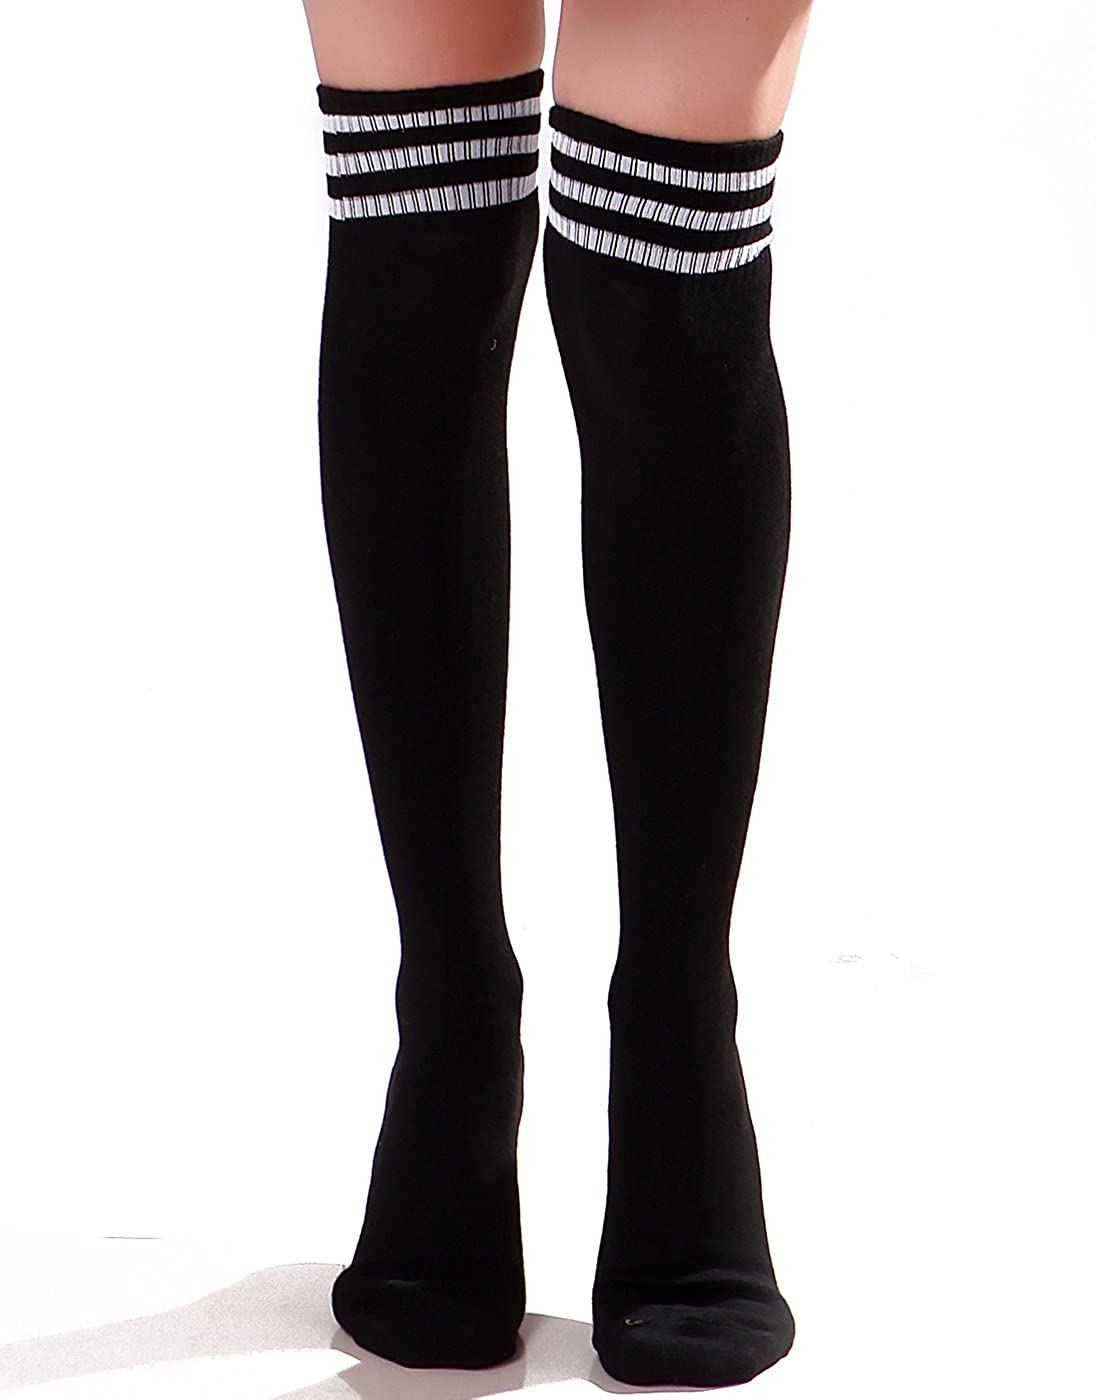 b86d8a44ae7 HDE Women Three Stripe Over Knee High Socks Extra Long Athletic Sport Tube  Socks (Black White) at Amazon Women s Clothing store